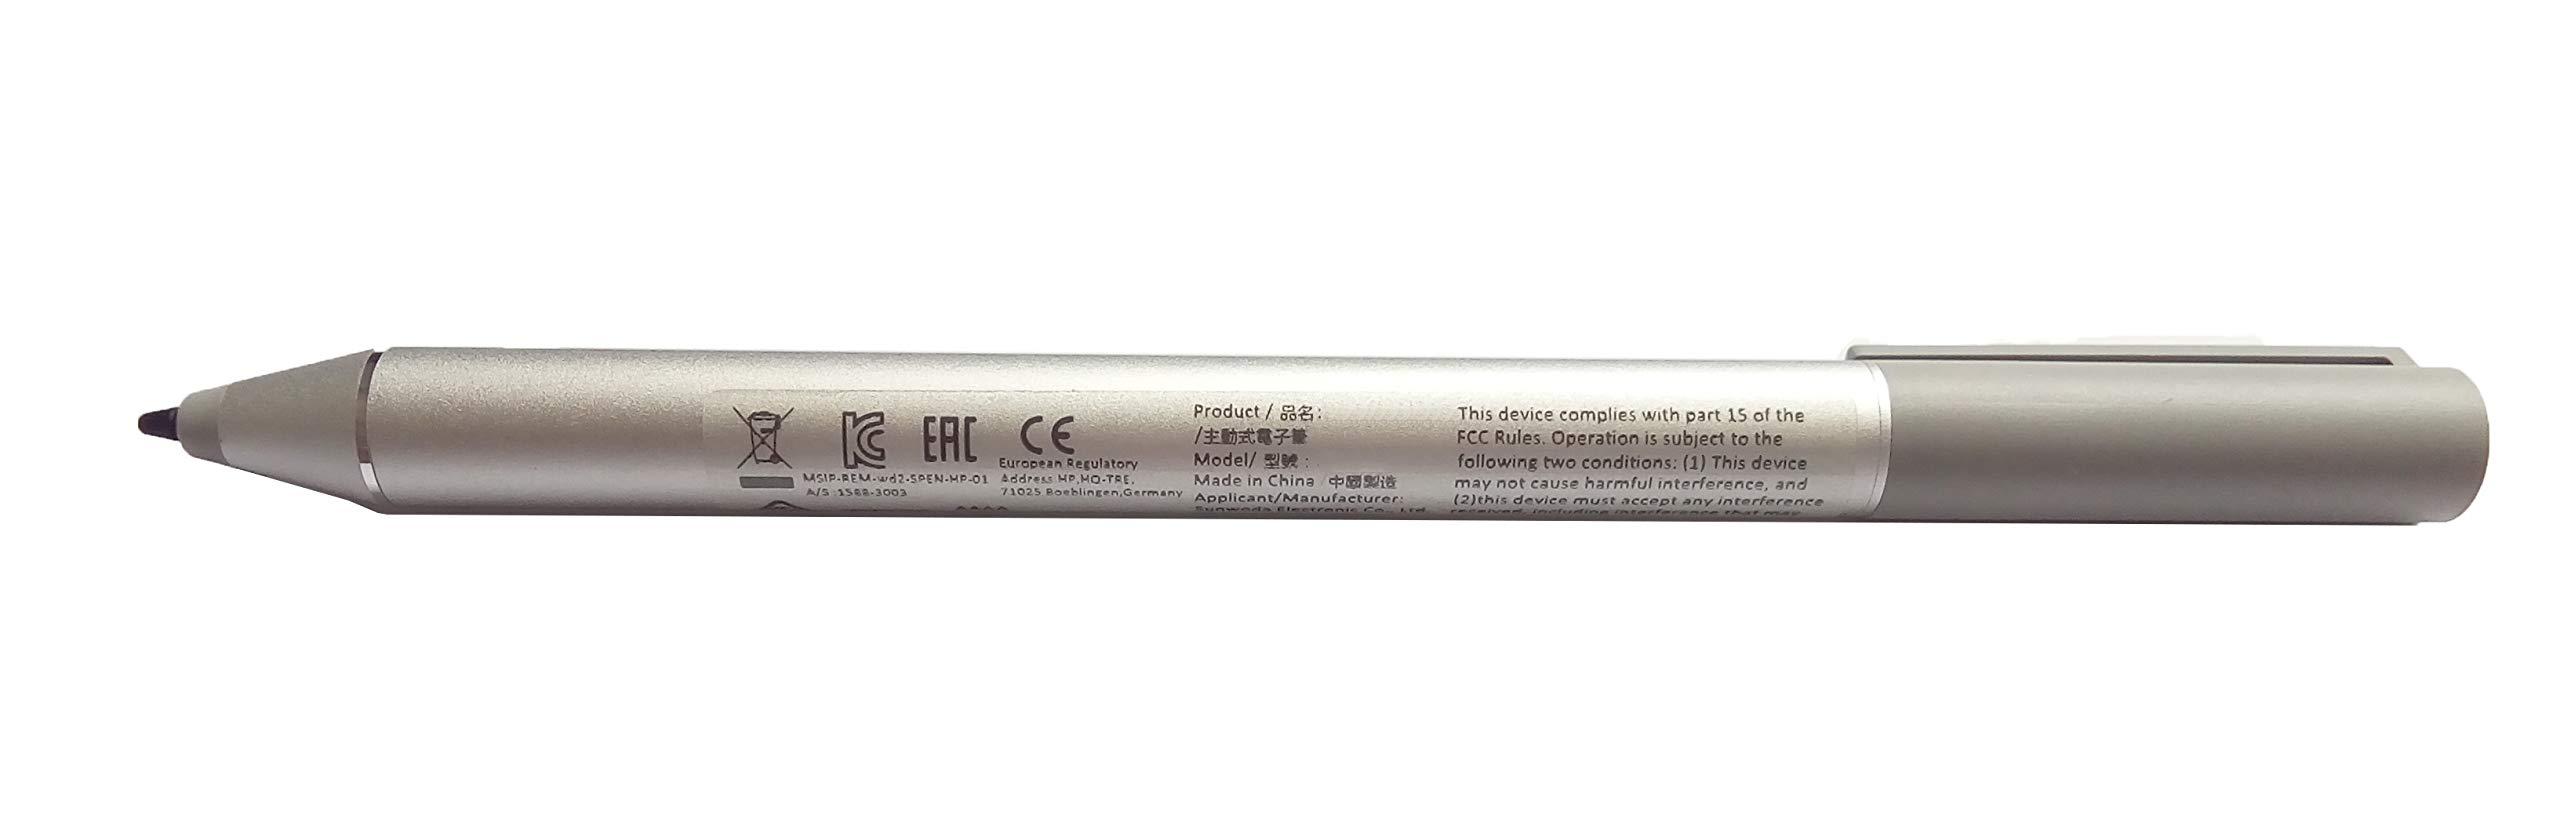 Stylus Touch S Pen for Digital Stylus for Selected HP x360 Spectre Envy Pavilion Laptops,